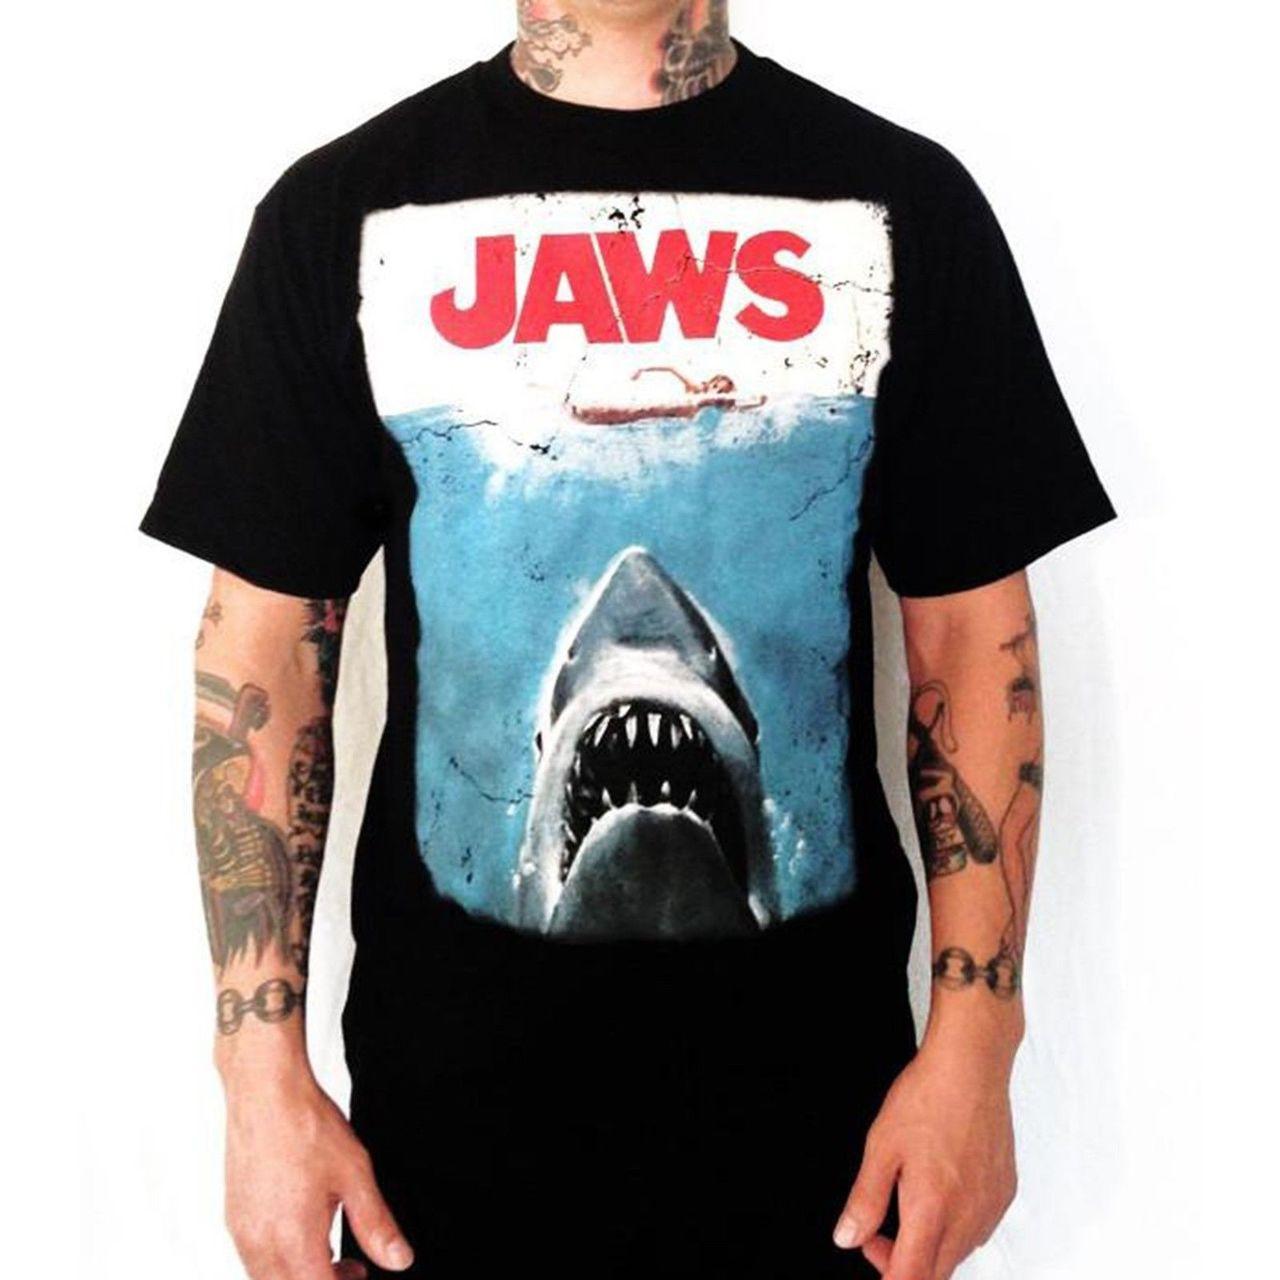 universal the original 1975 jaws movie poster tee shirt black steven spielberg